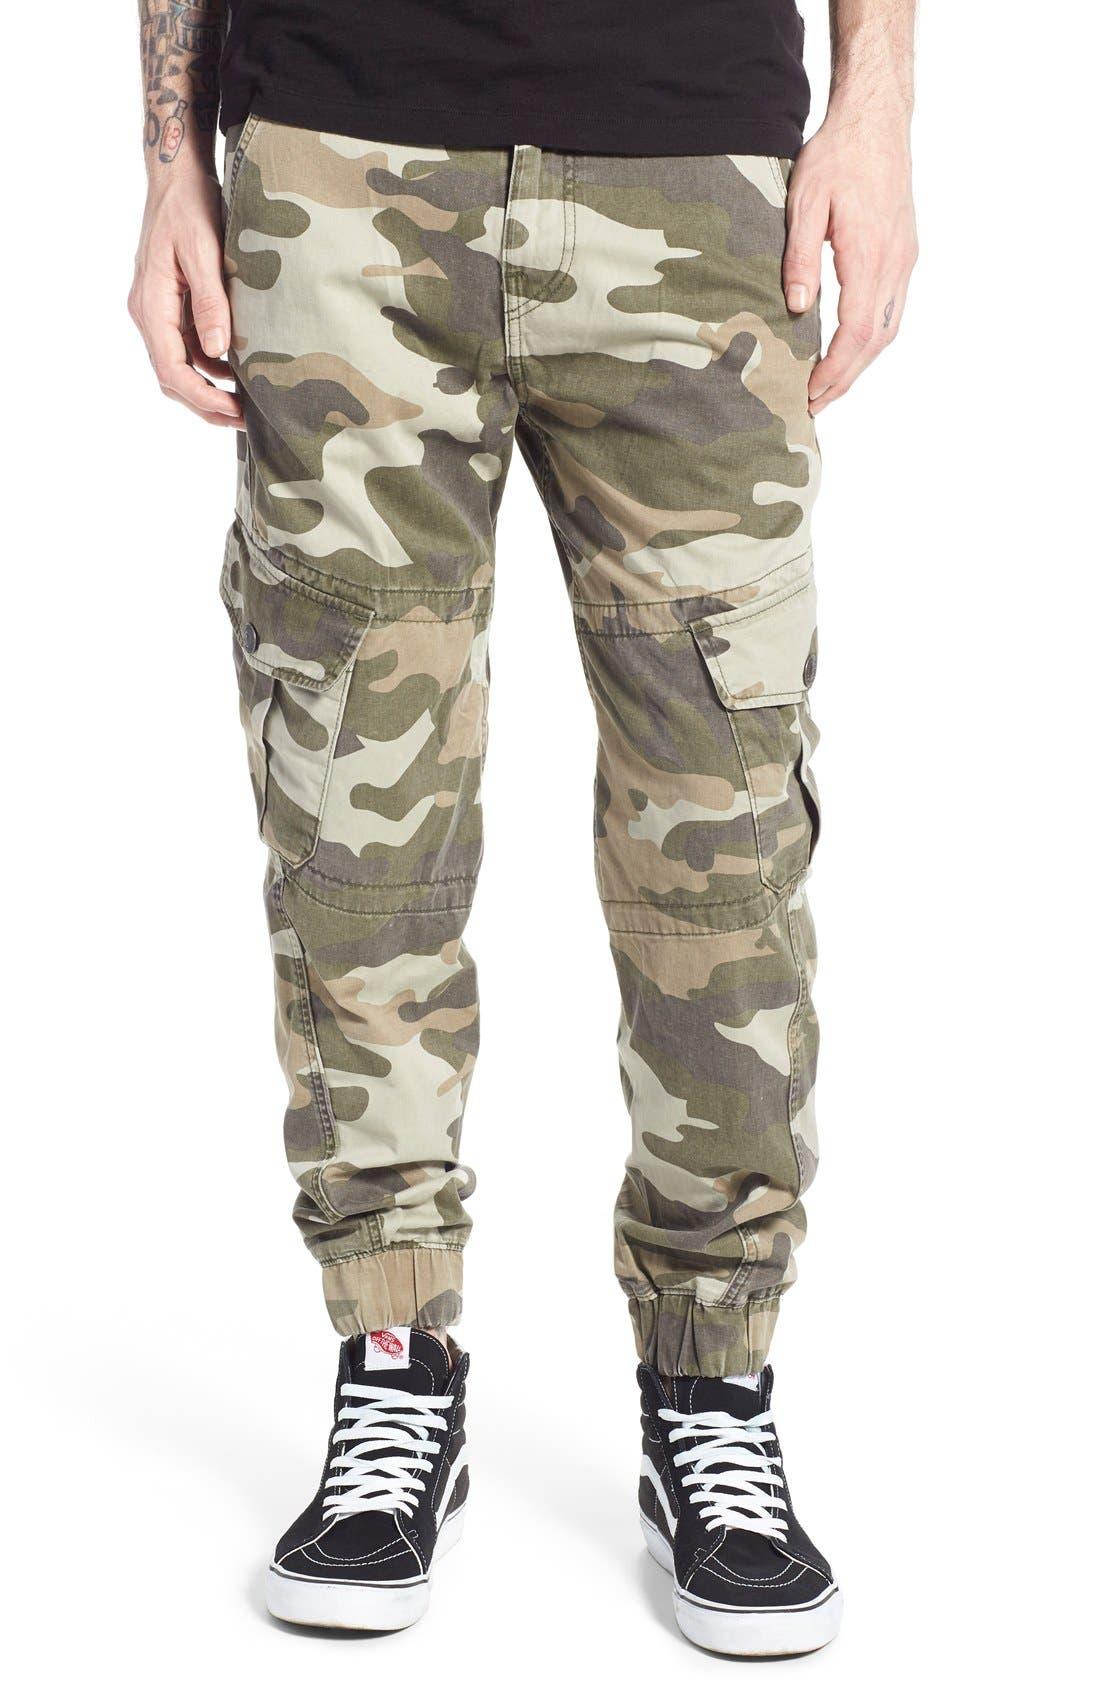 True Religion Brand Jeans Camo Cargo Jogger Pants (CWF ...